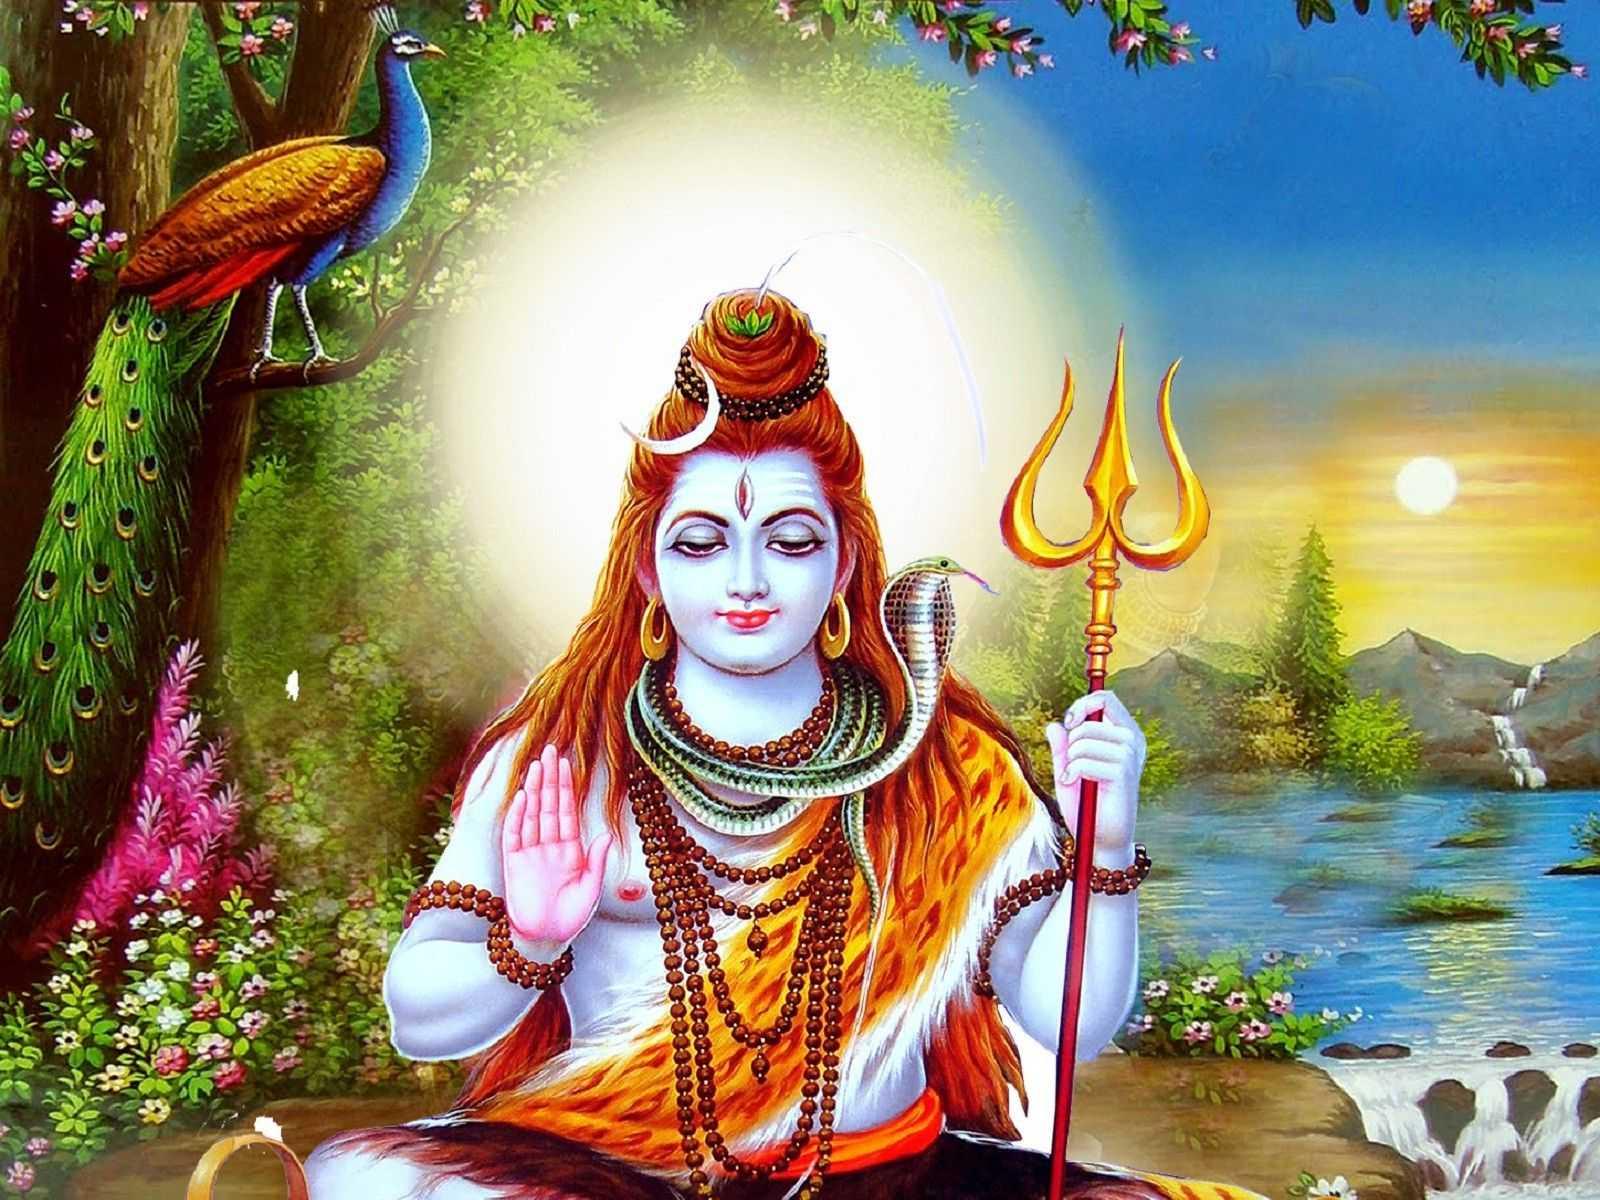 Lord Shiva Image with Third Eye, Shiva Bhagwan Image - God Shiva Image in Swastika Mudra with Third Eye on Head. God Shiva Picture, Bhagwan Shiv, Bholenath, Shiv, Shiv Ji, Shiv Bhakti Wallpaper.